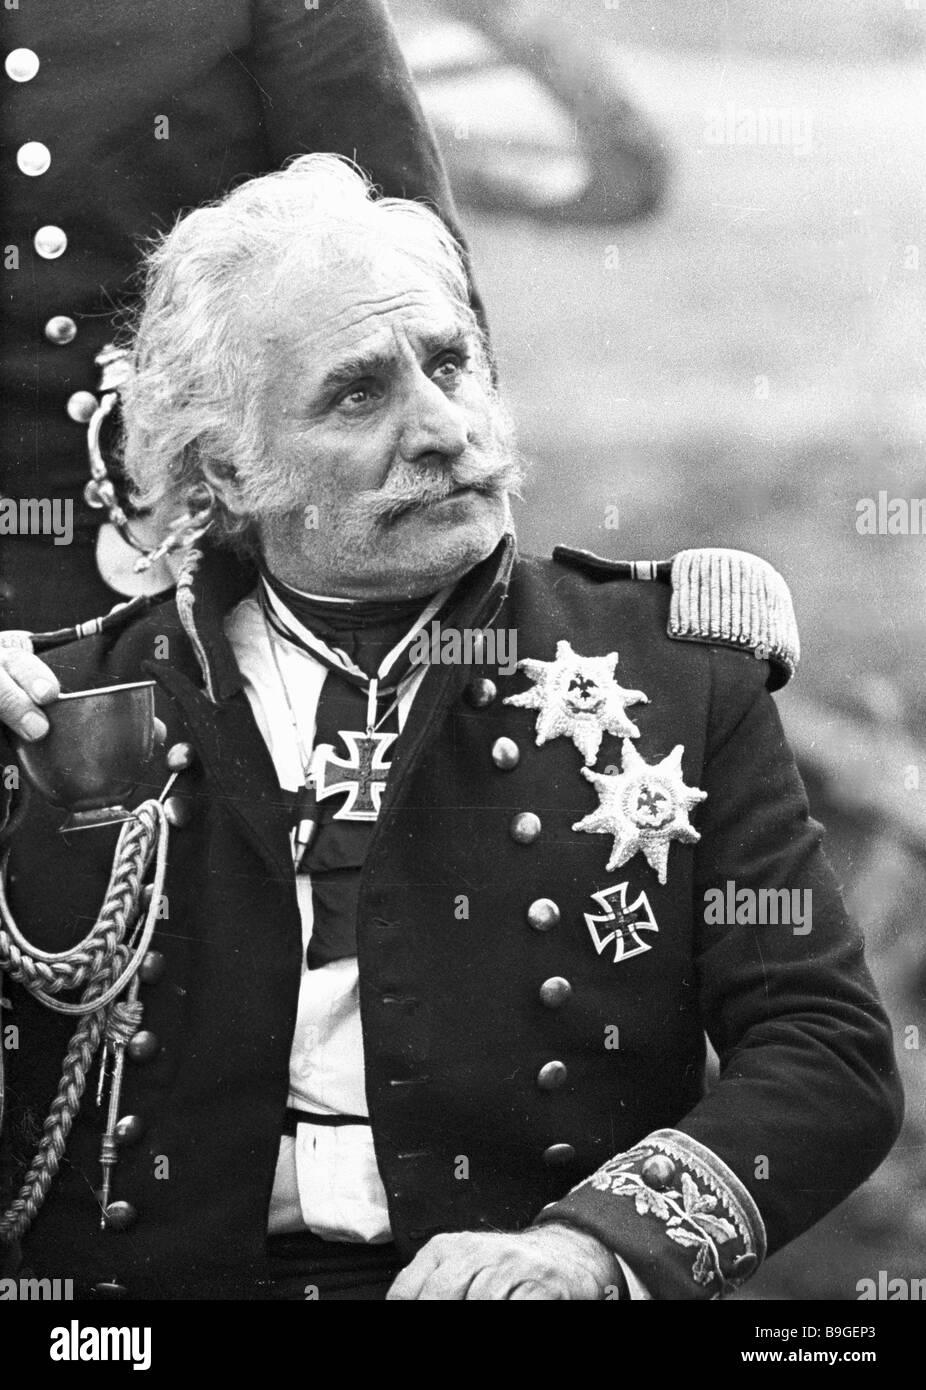 People Artist of the USSR Sergo Zakariadze as Marshall Gebhard Blucher in the film Waterloo - Stock Image